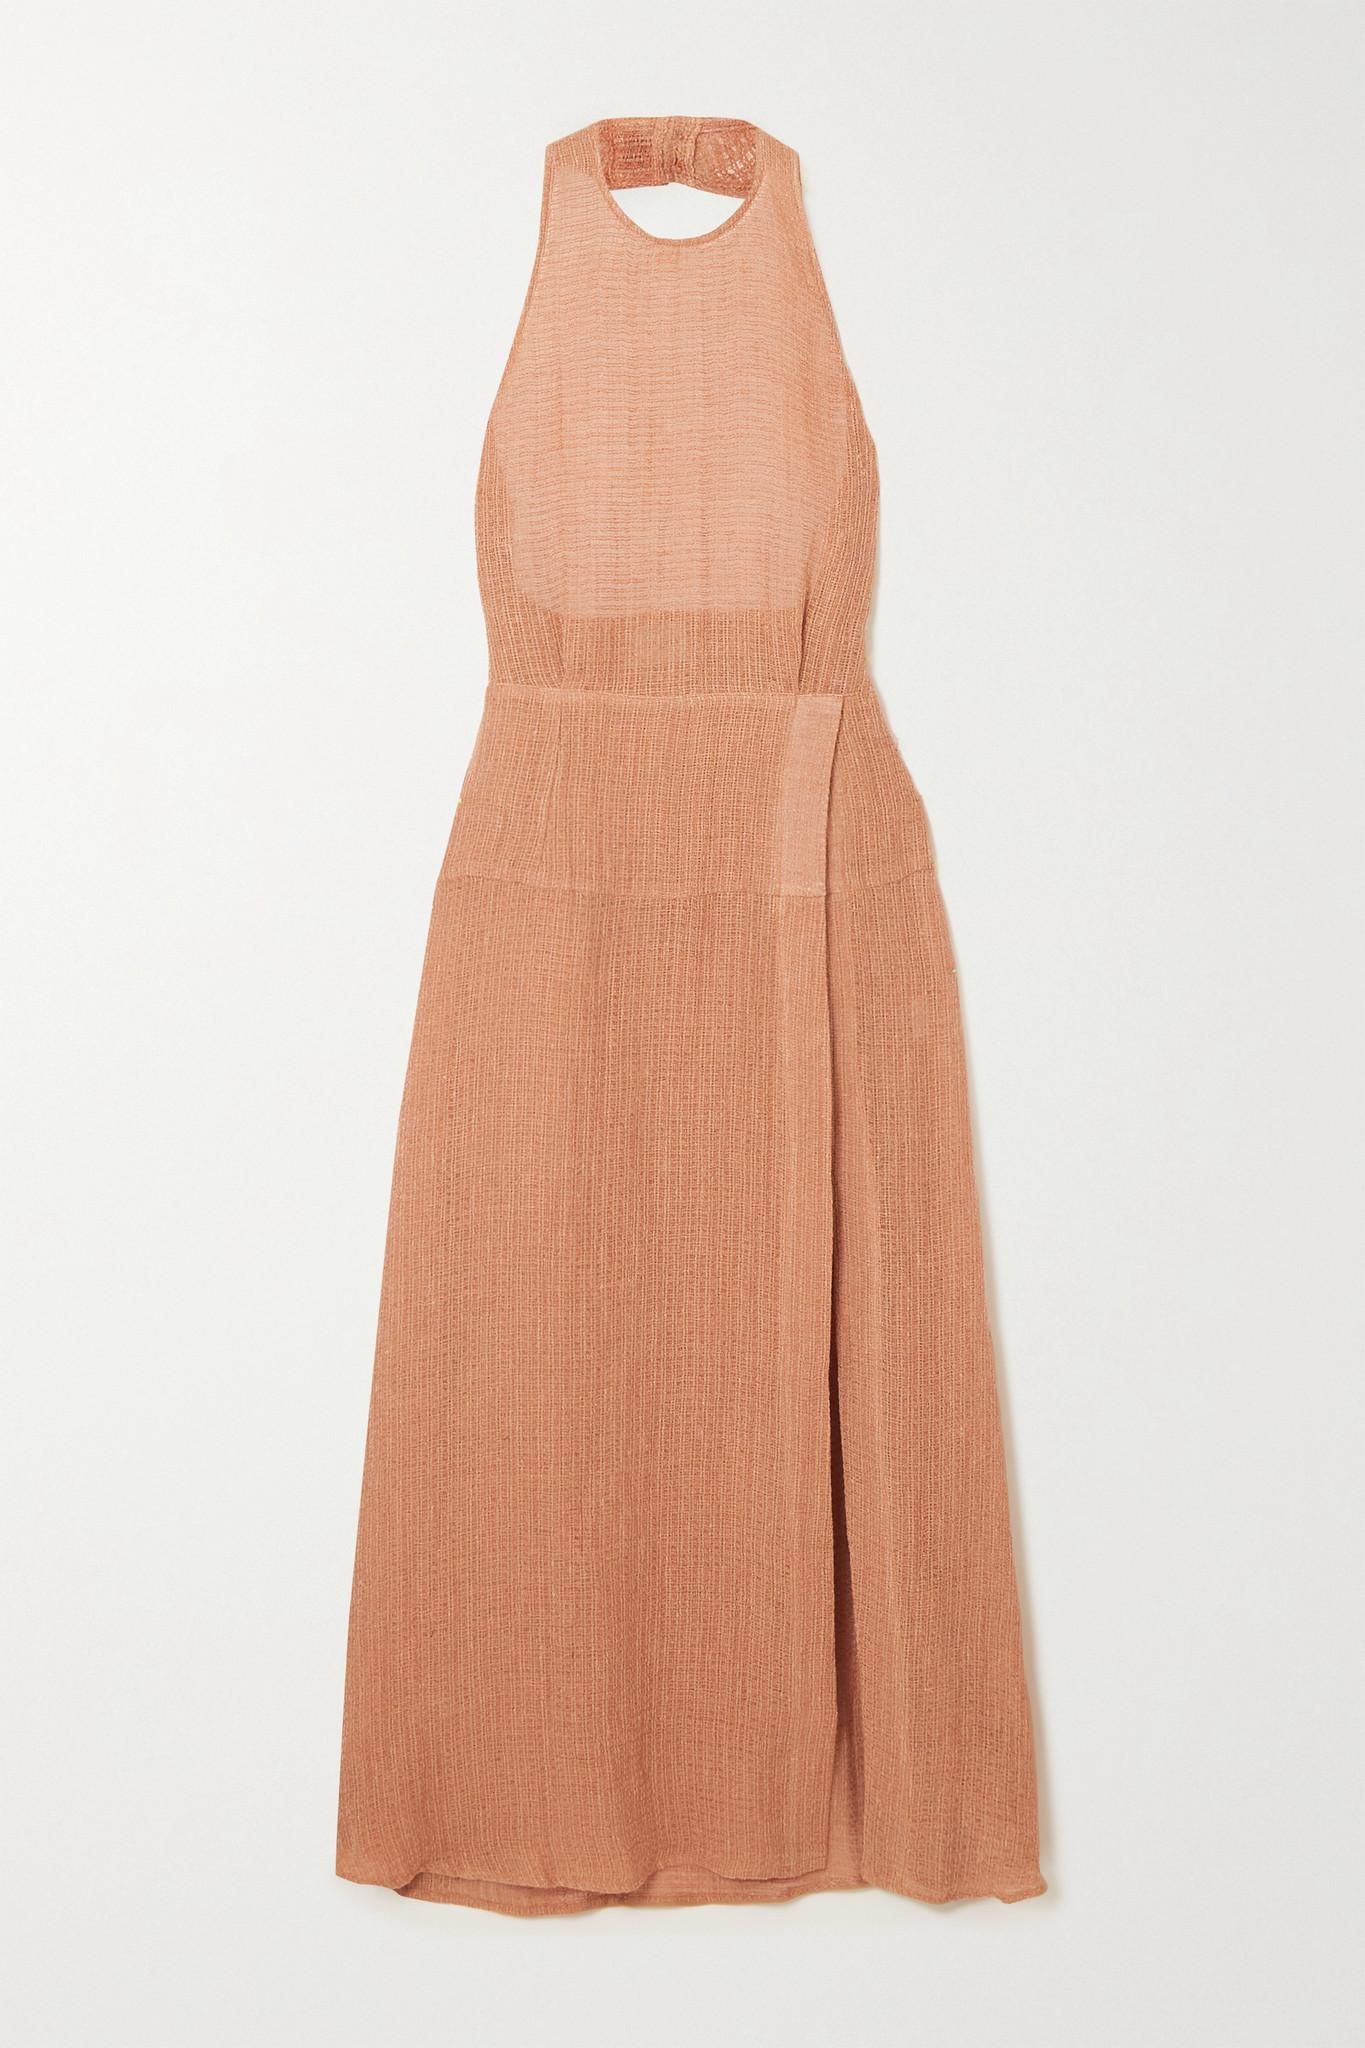 LE KASHA - + Net Sustain Dairut Organic Linen-gauze Halterneck Maxi Dress - Pink - small